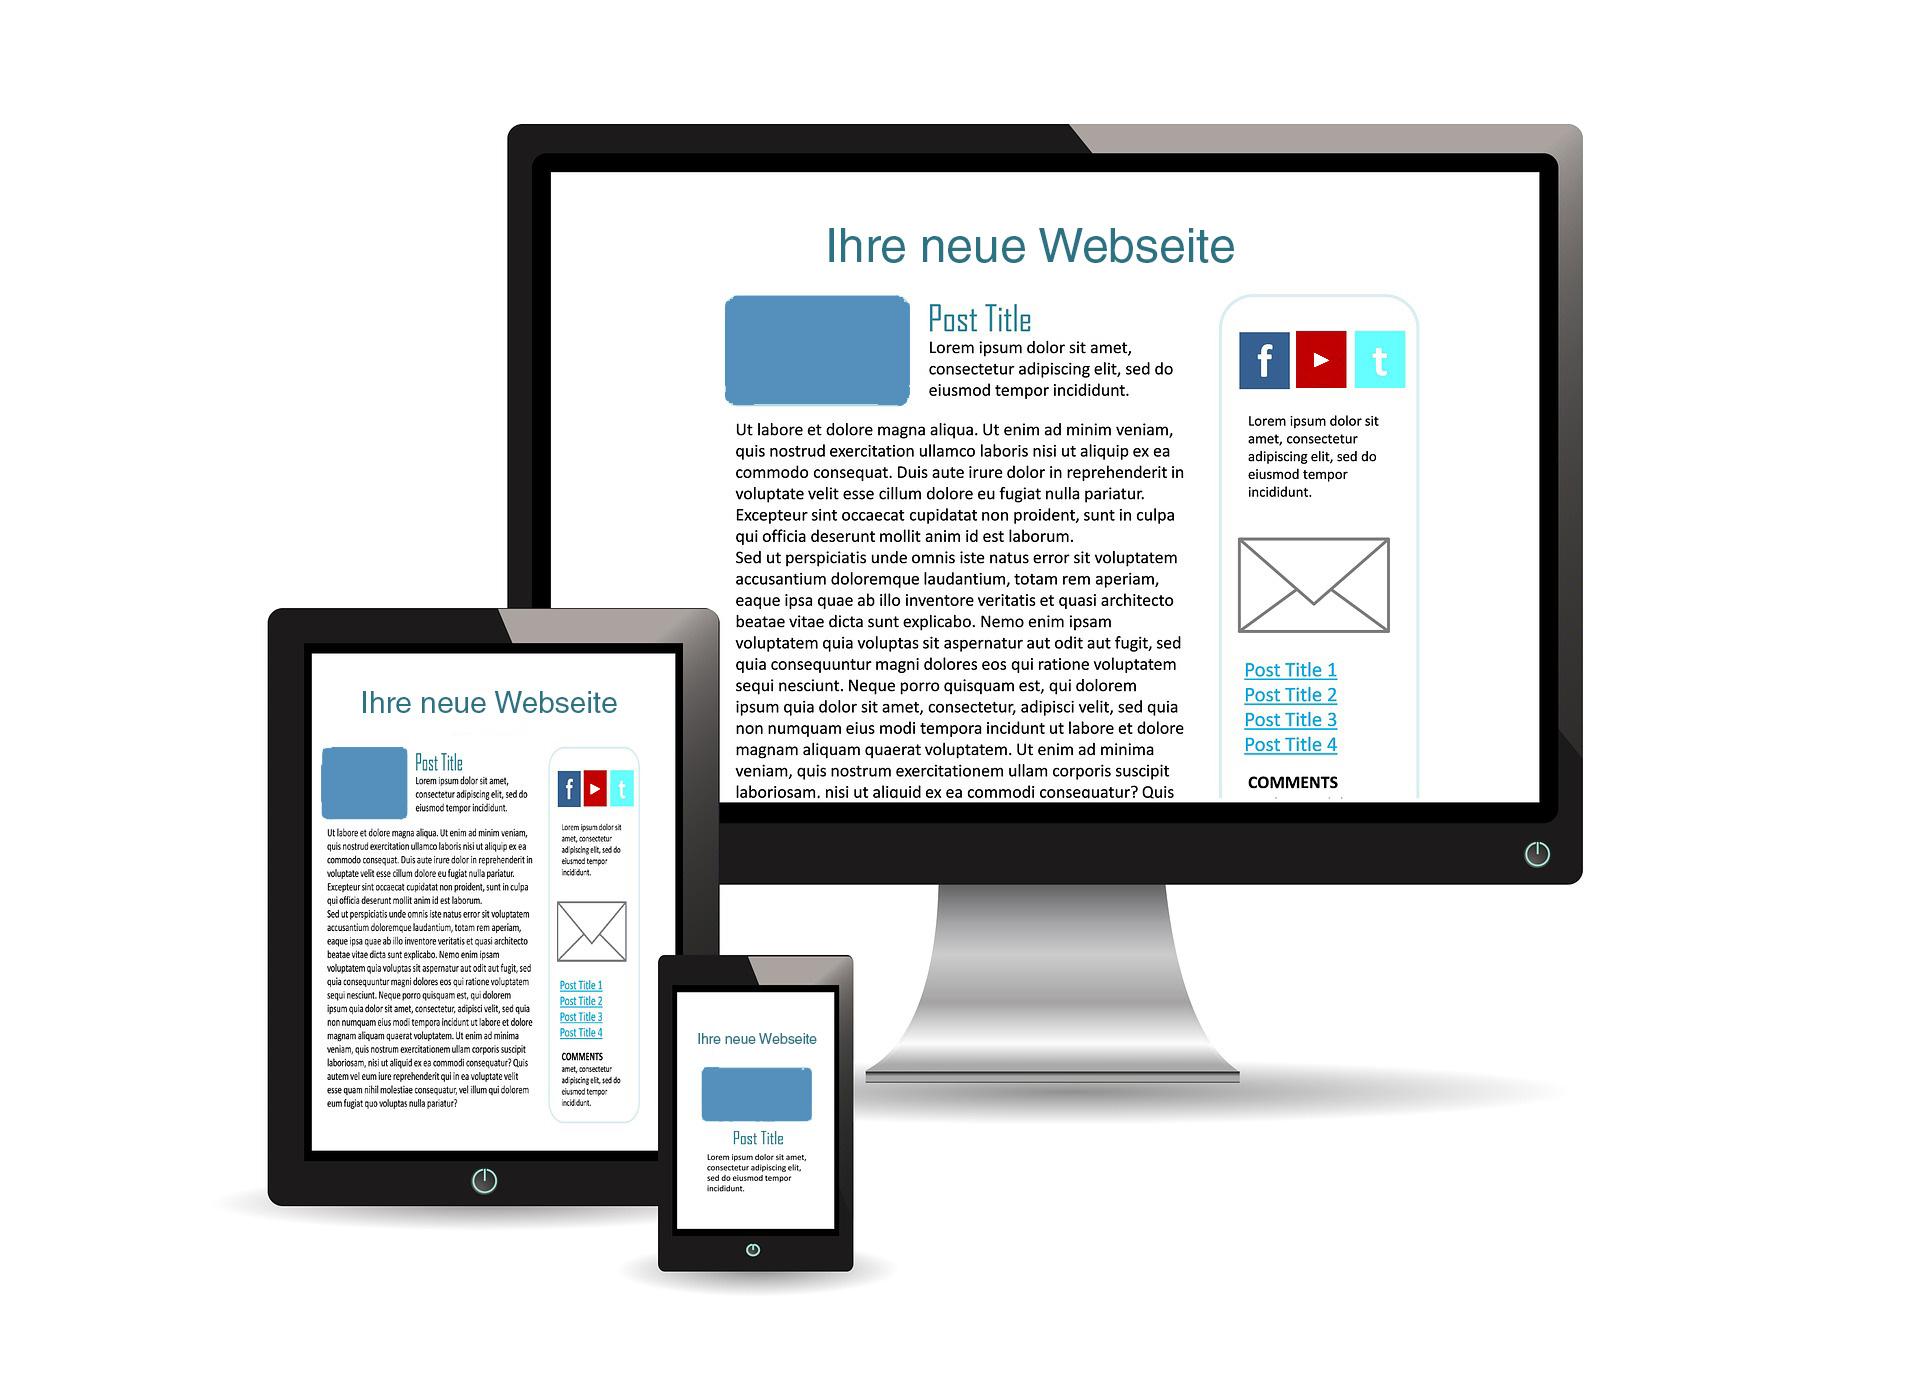 web updates kmu GmbH-wuk-WordPress und SEO Agentur - webagentur-fuer-wordpress-und-seo-spezialpreis-webseite